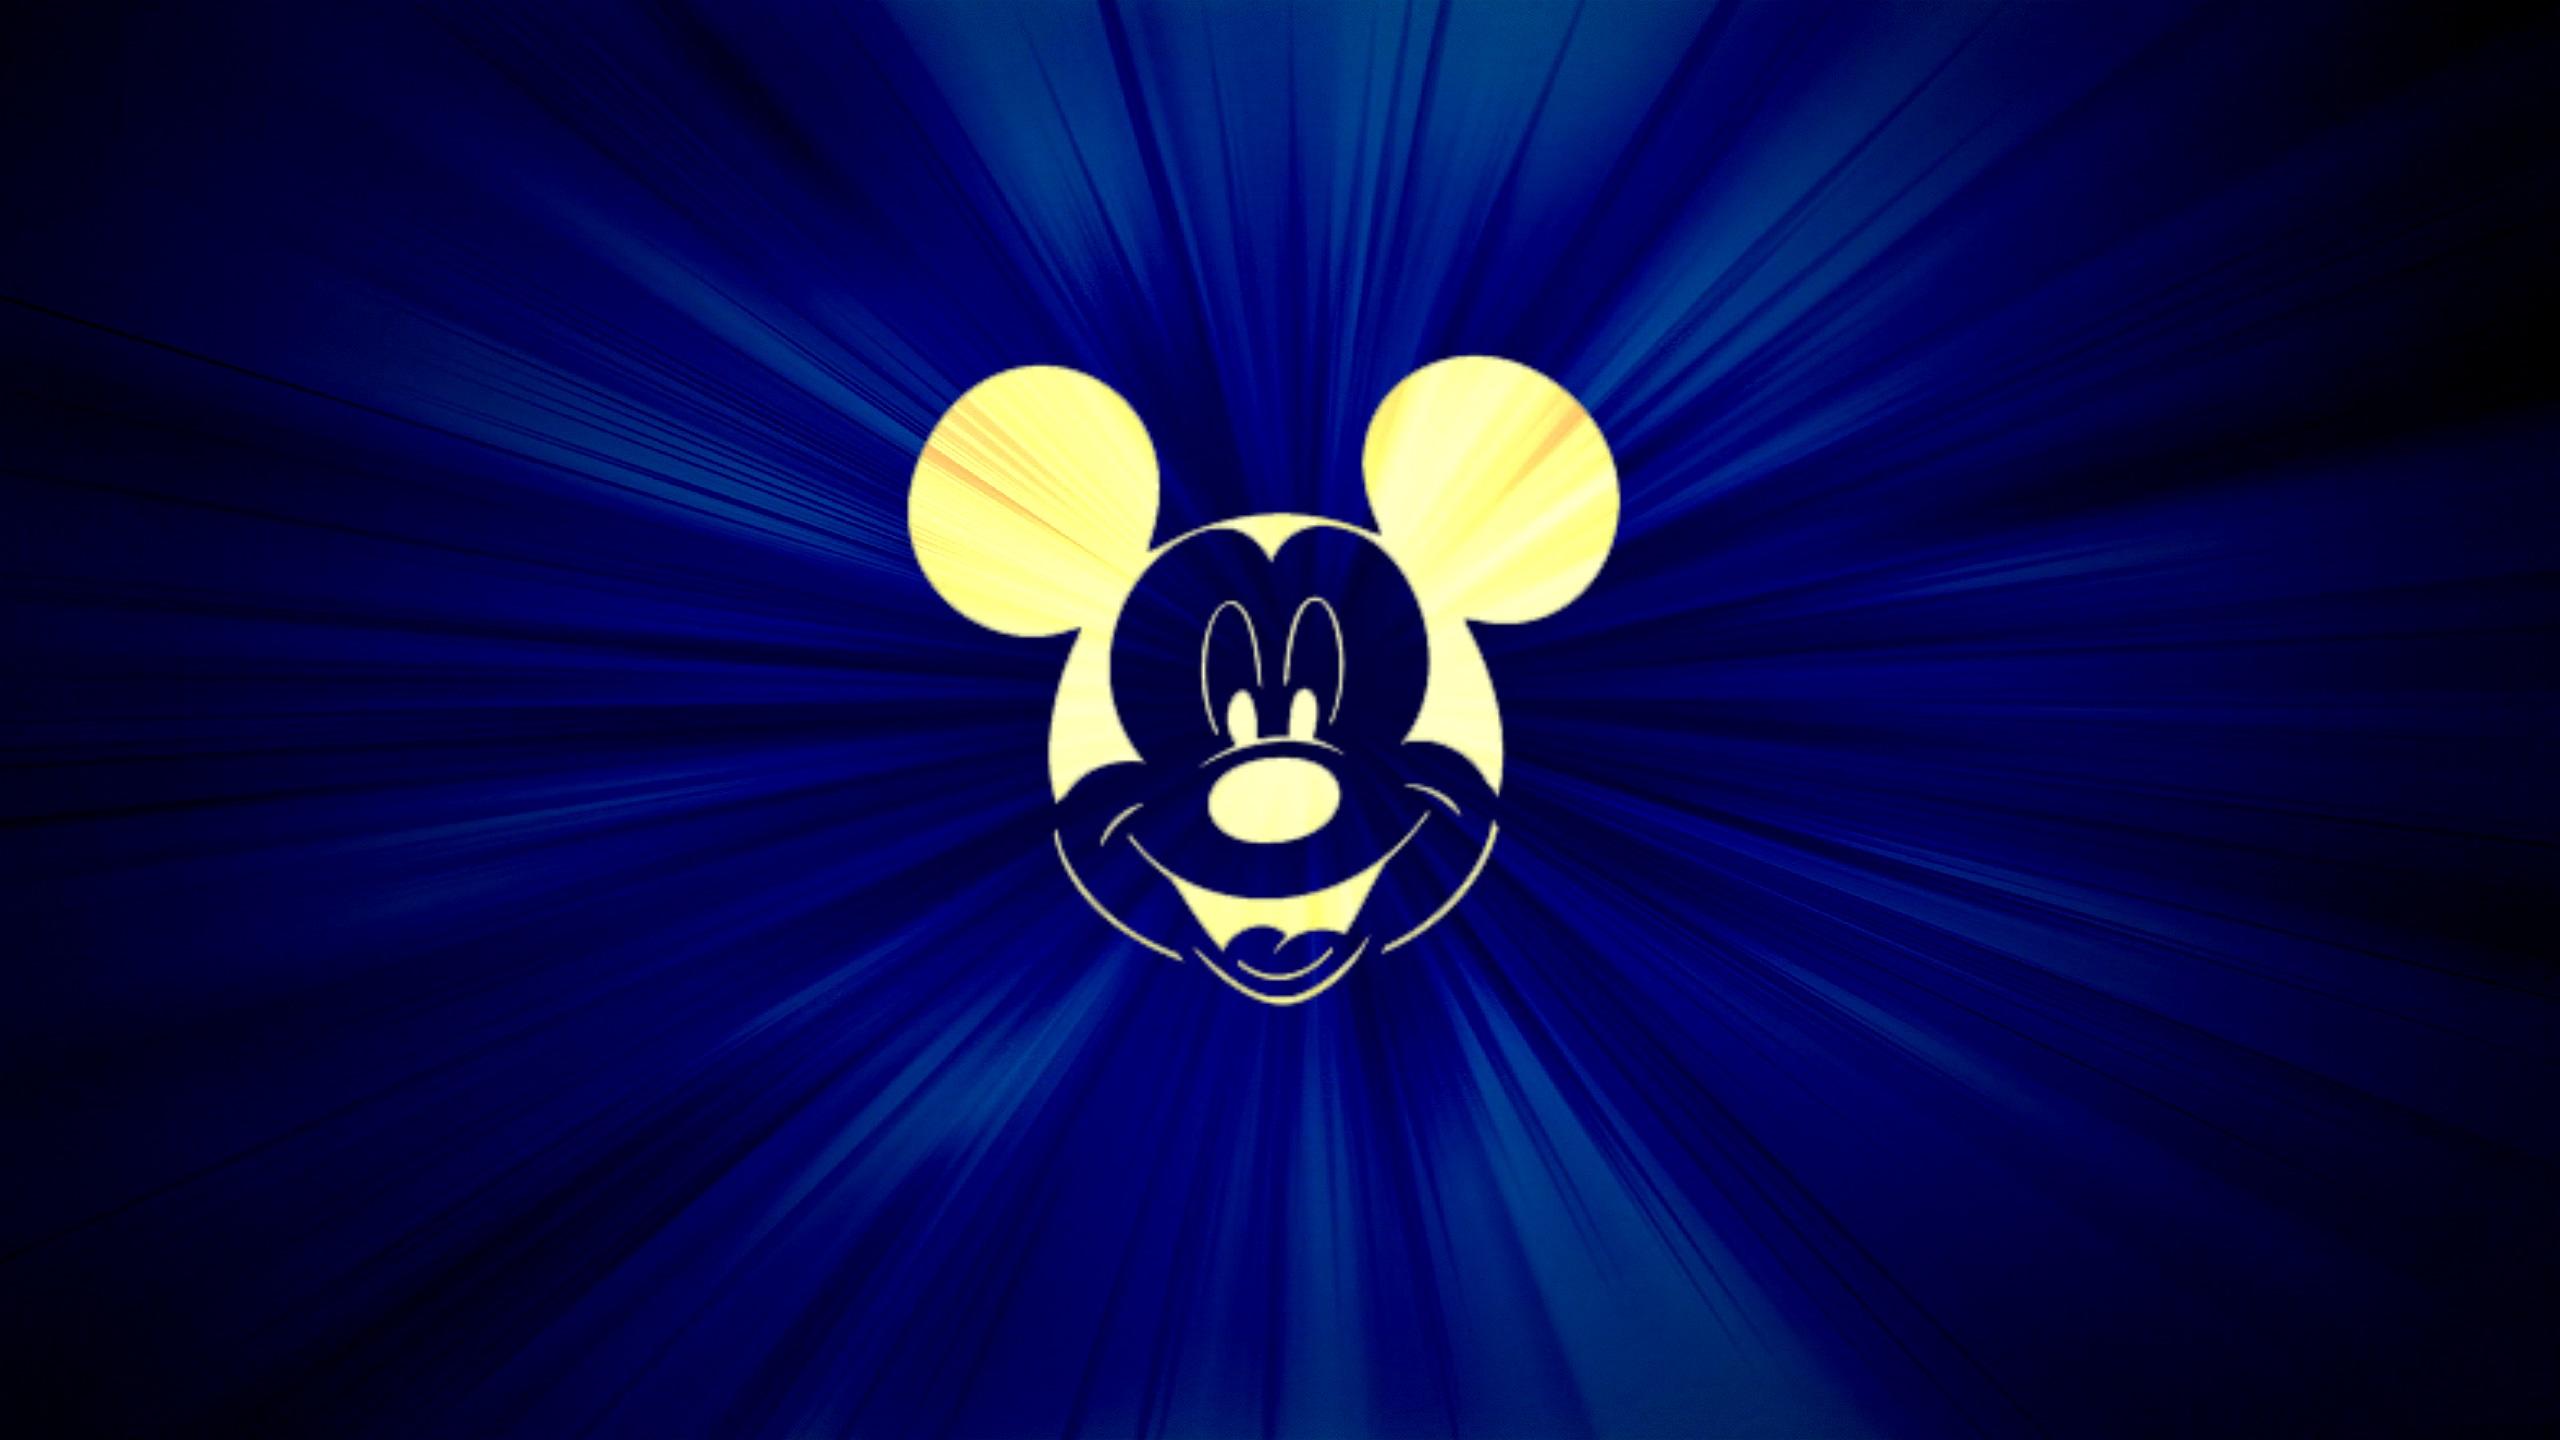 Cute Minnie Mouse Wallpaper Mickey Mouse Wallpaper Hd Pixelstalk Net